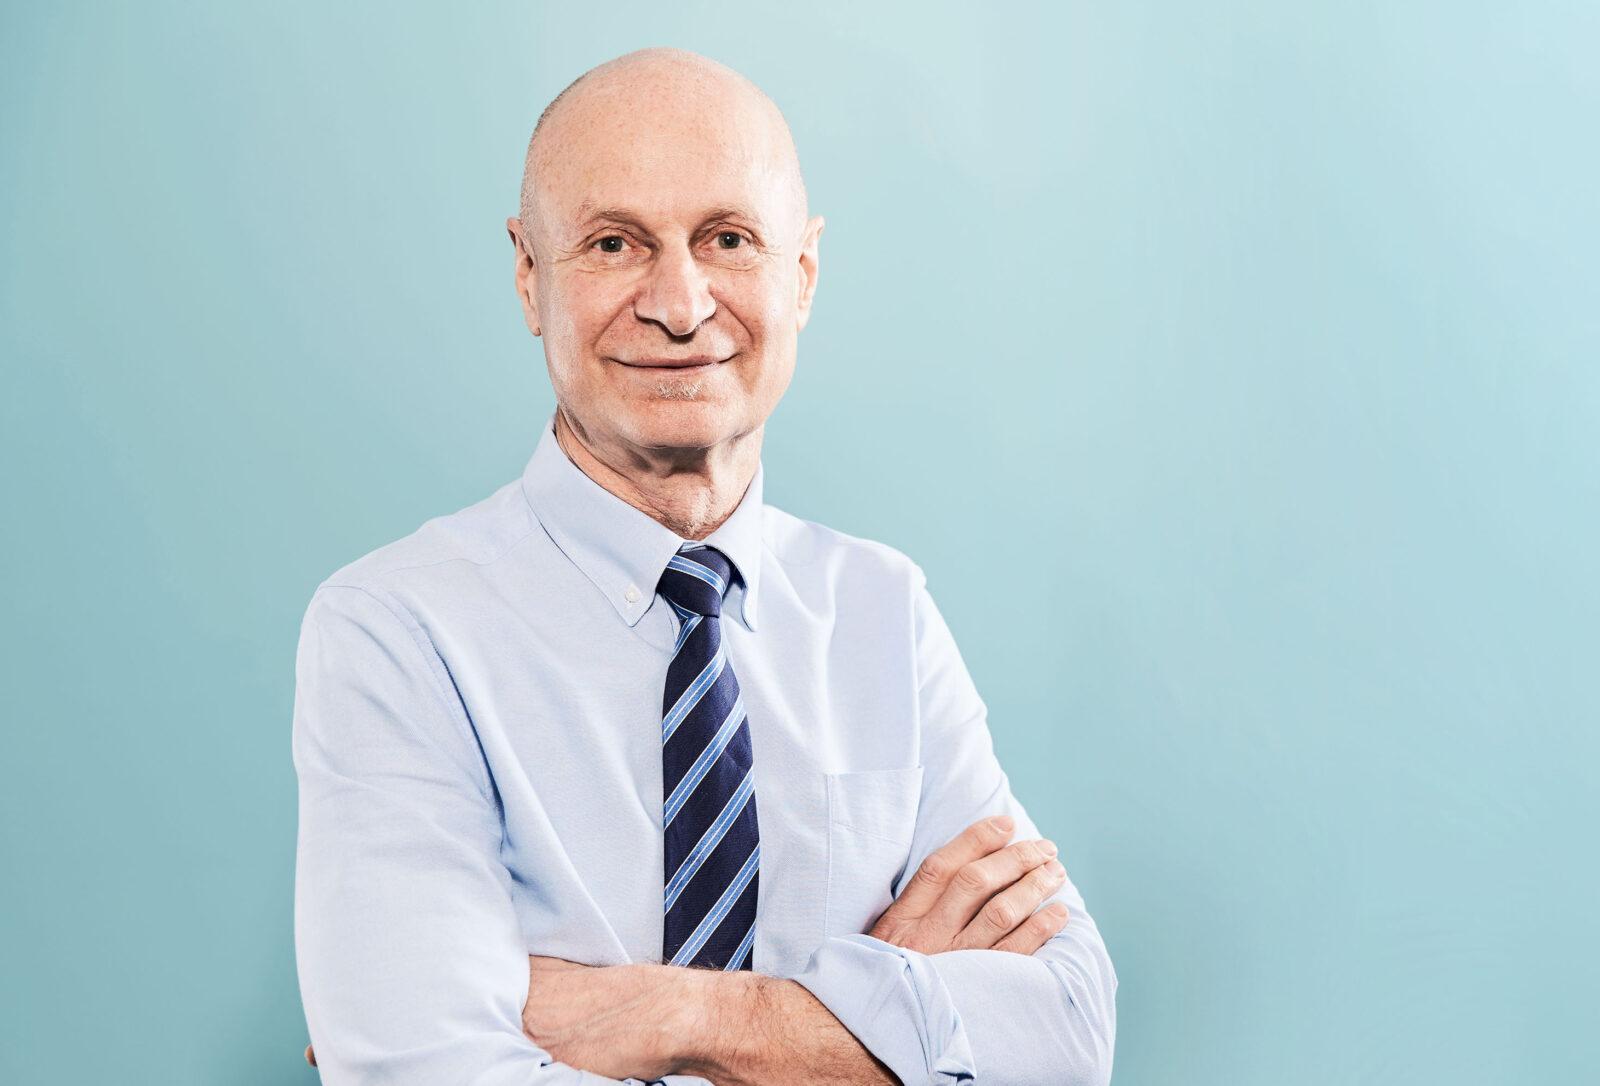 Associate Professor Philip Bekhor